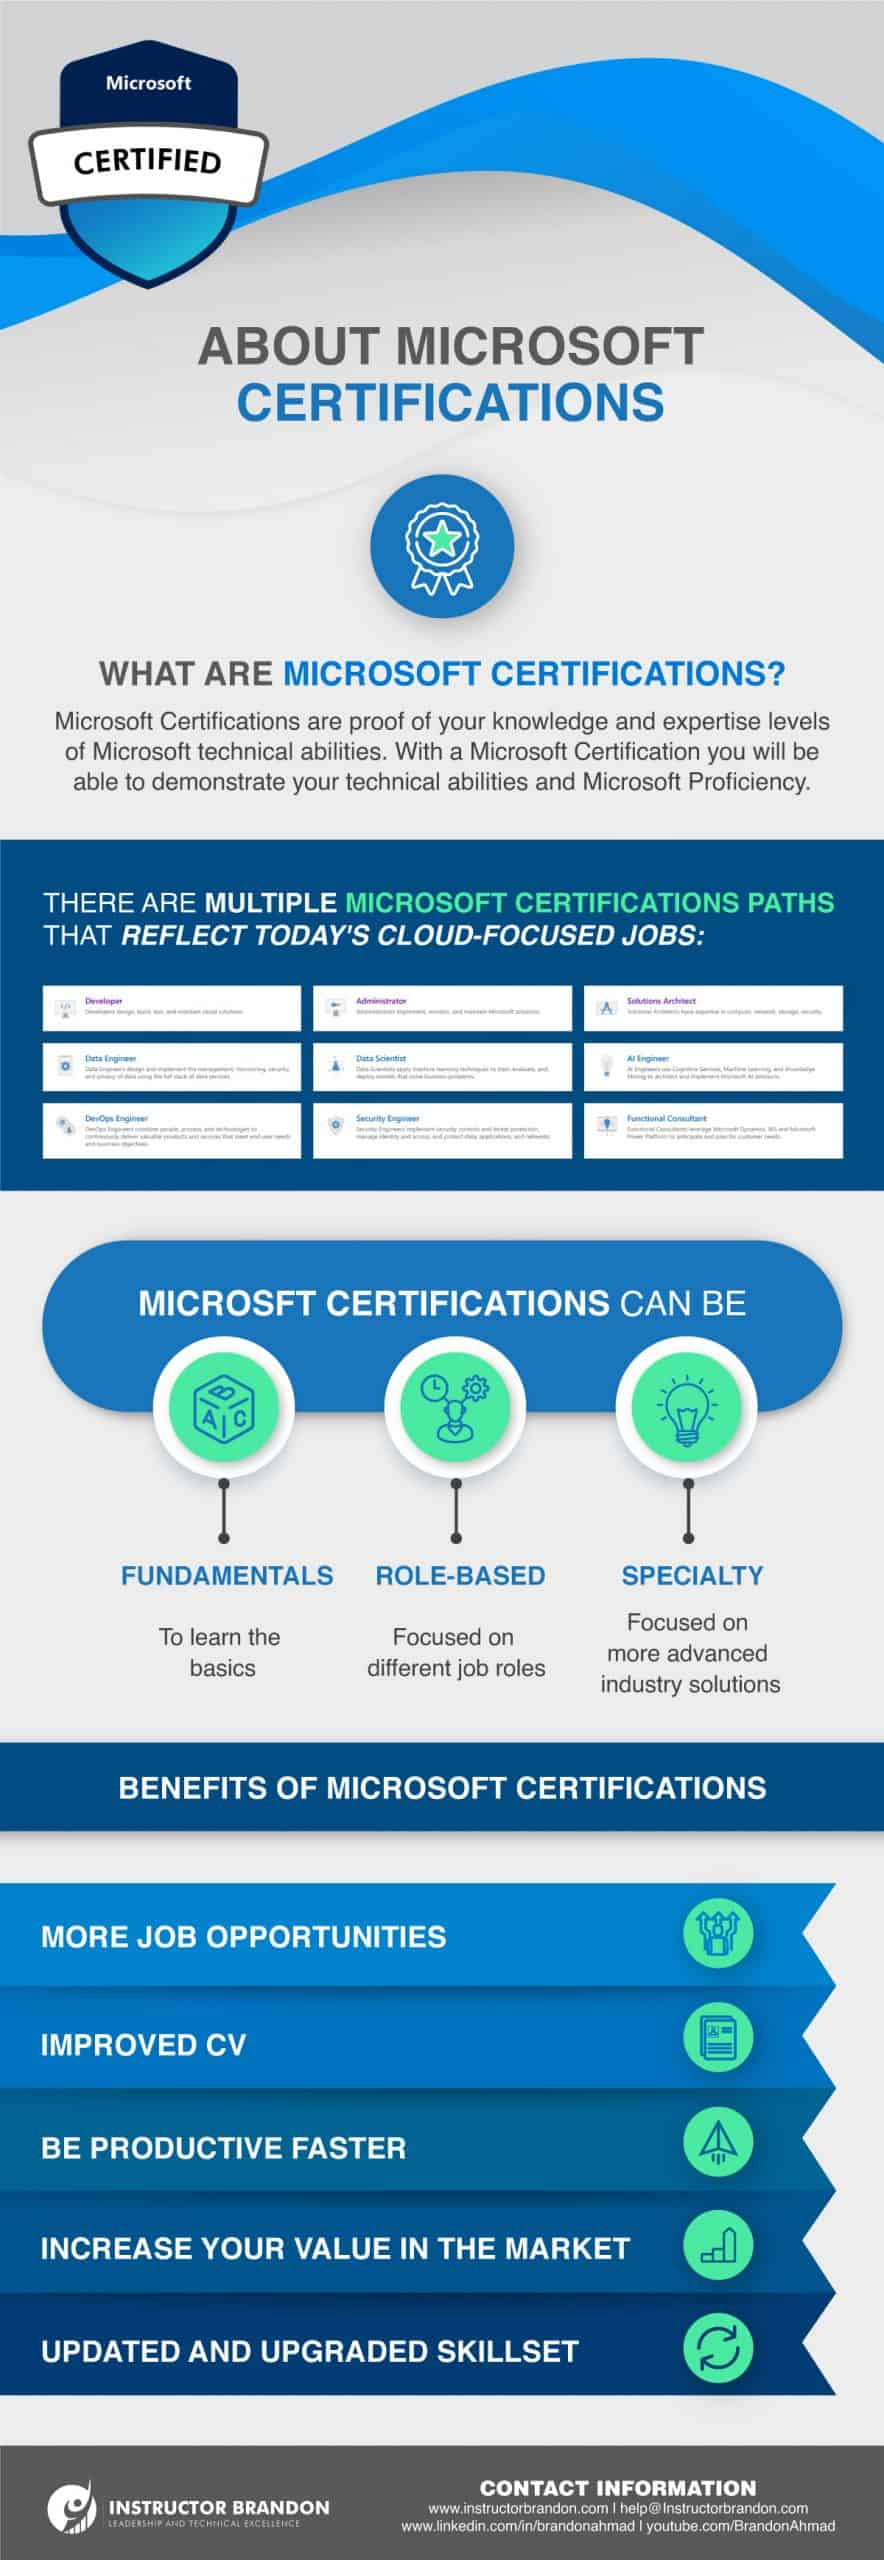 Microsoft Fundamentals Certifications